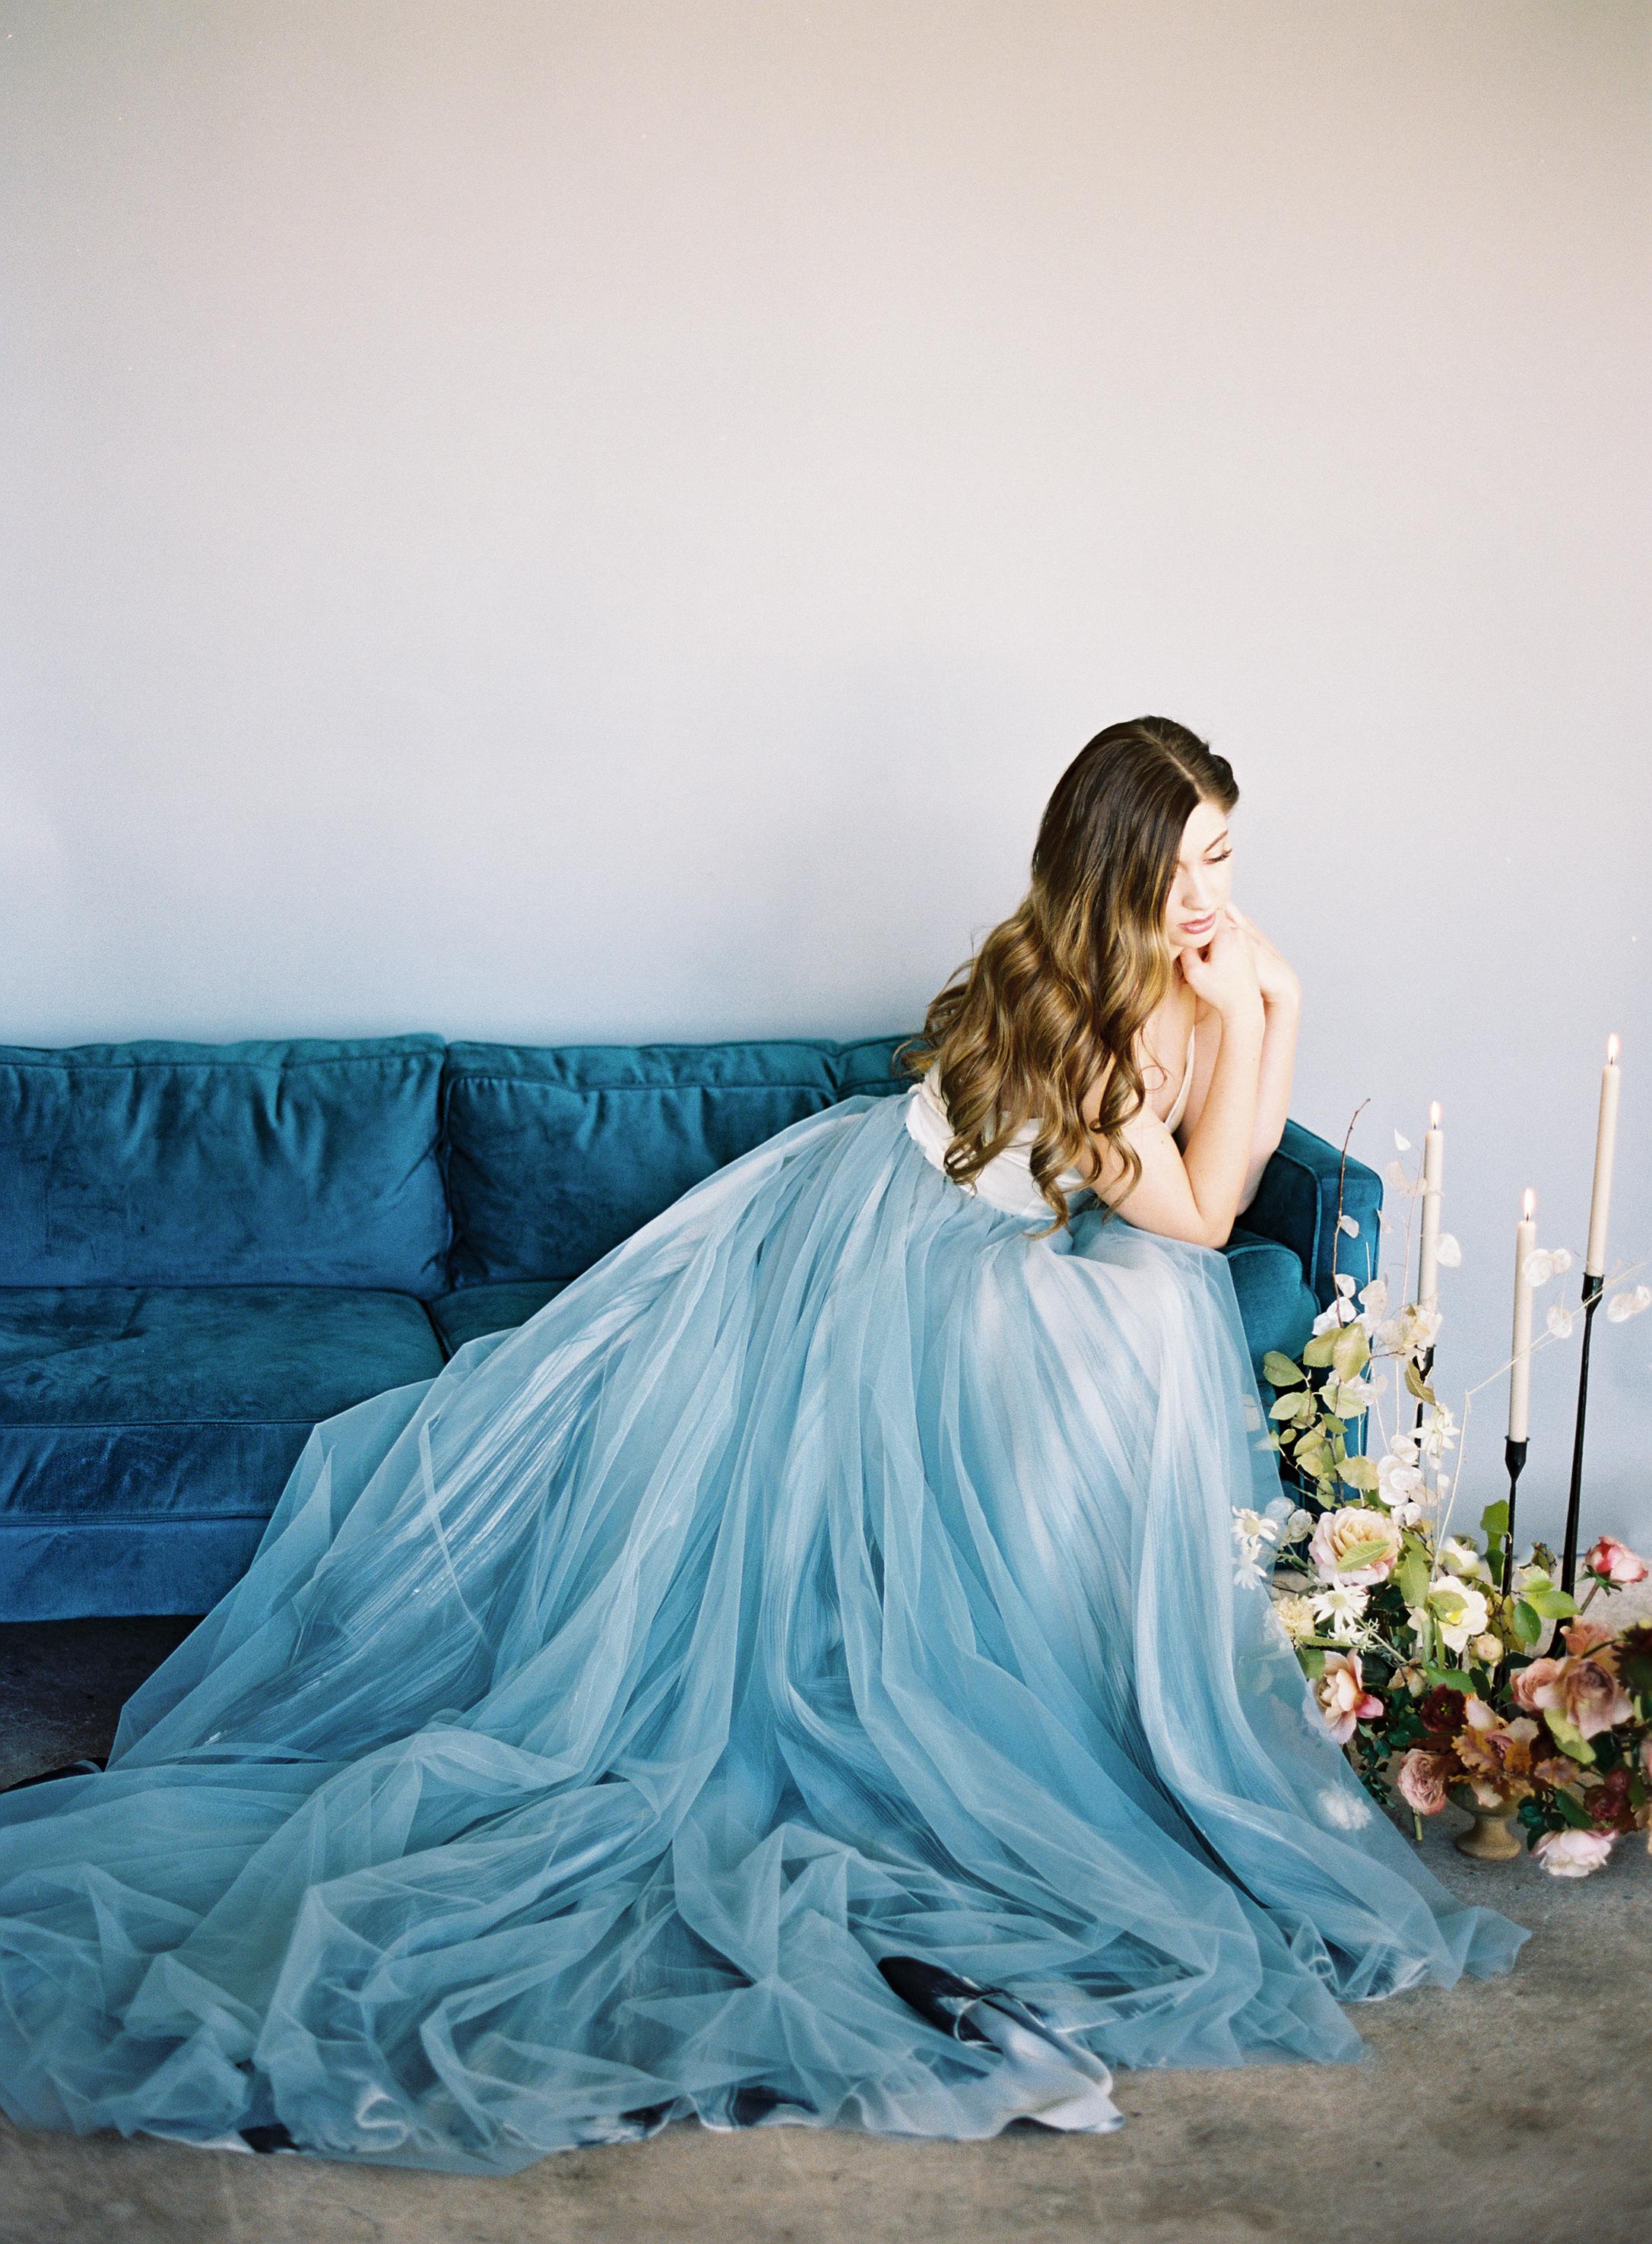 Sentient Floral Workshop-Carrie King Photographer-105.jpg